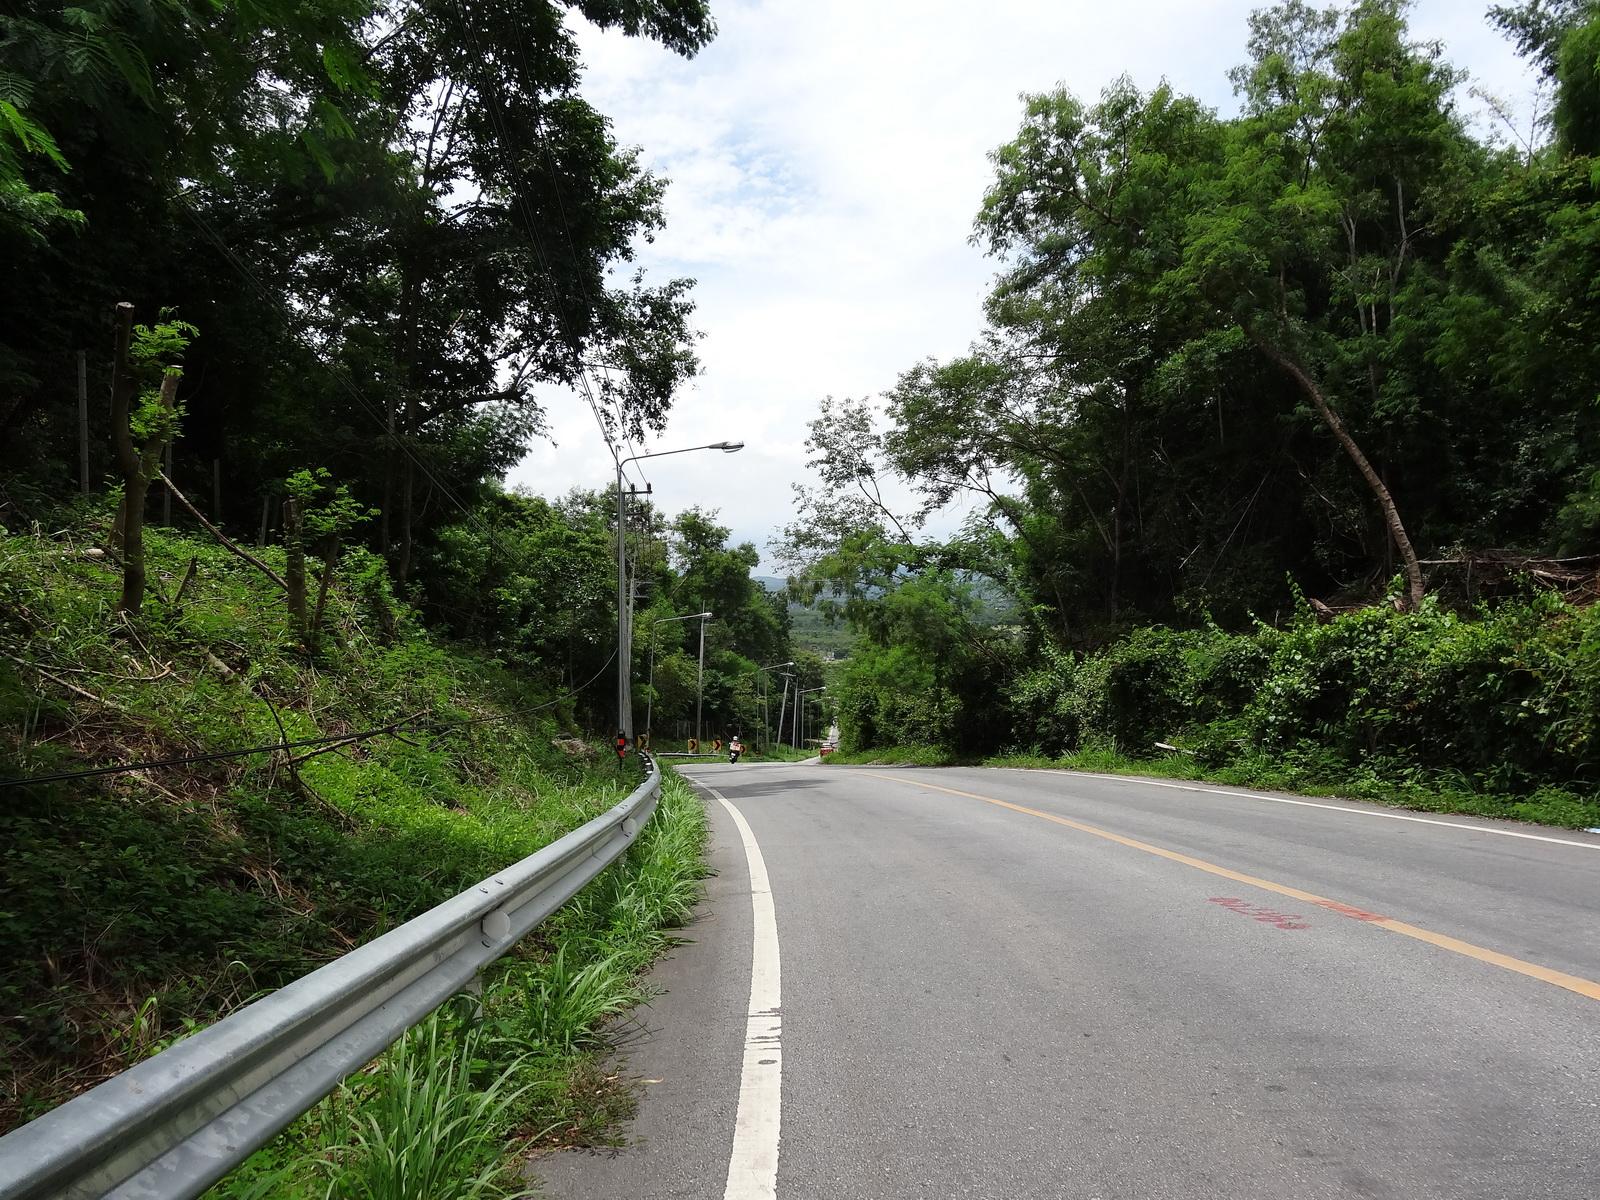 30 Pattaya 159